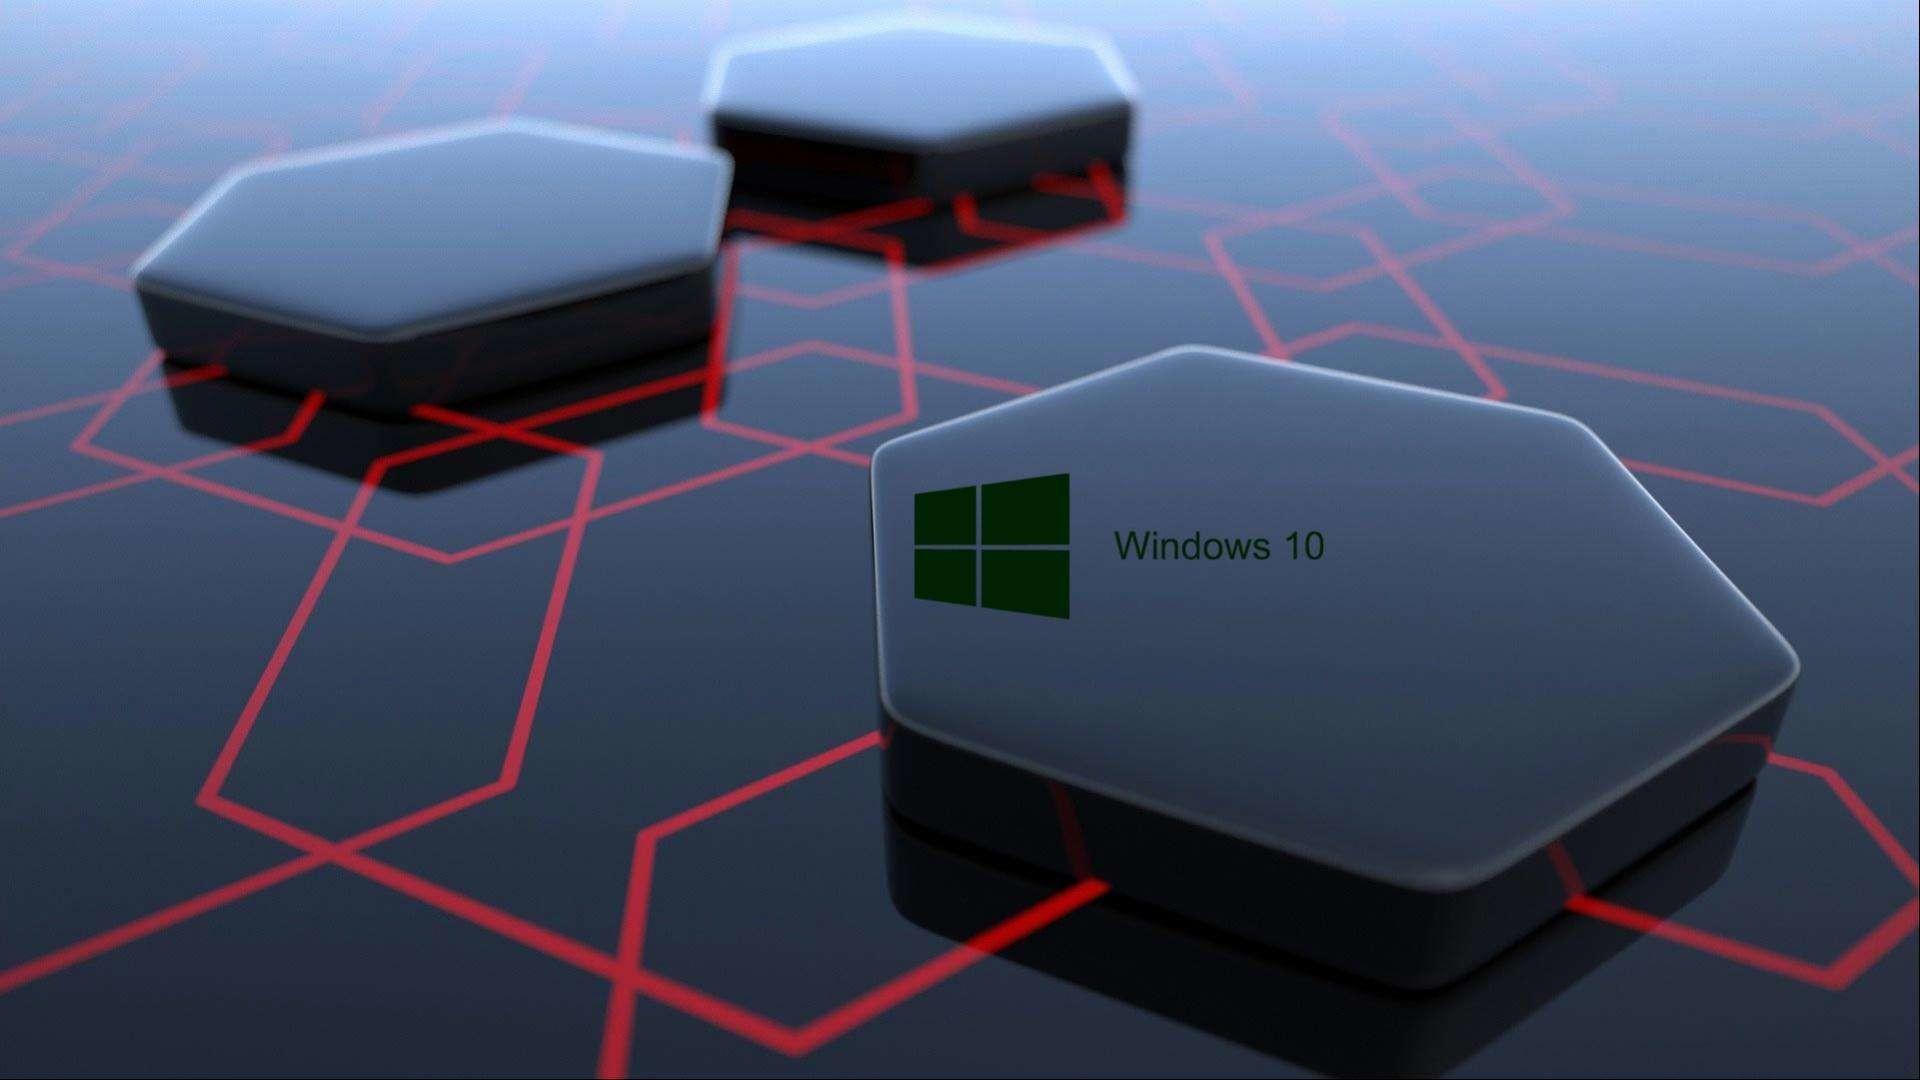 Wallpaper: Windows 10 Wallpaper Hd 1080p. Upload at July 31, 2015 by .